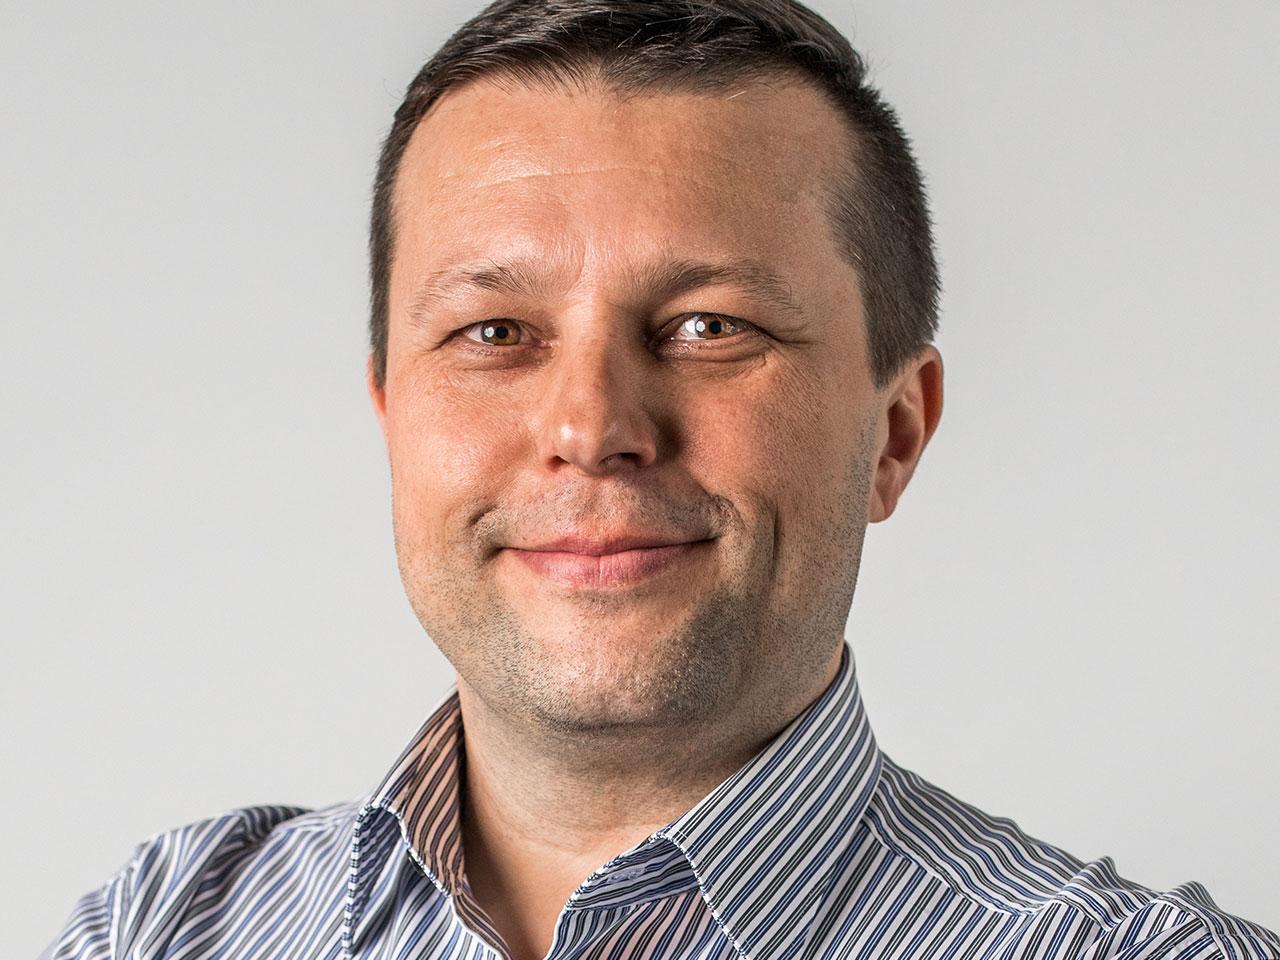 Martin Rakovský